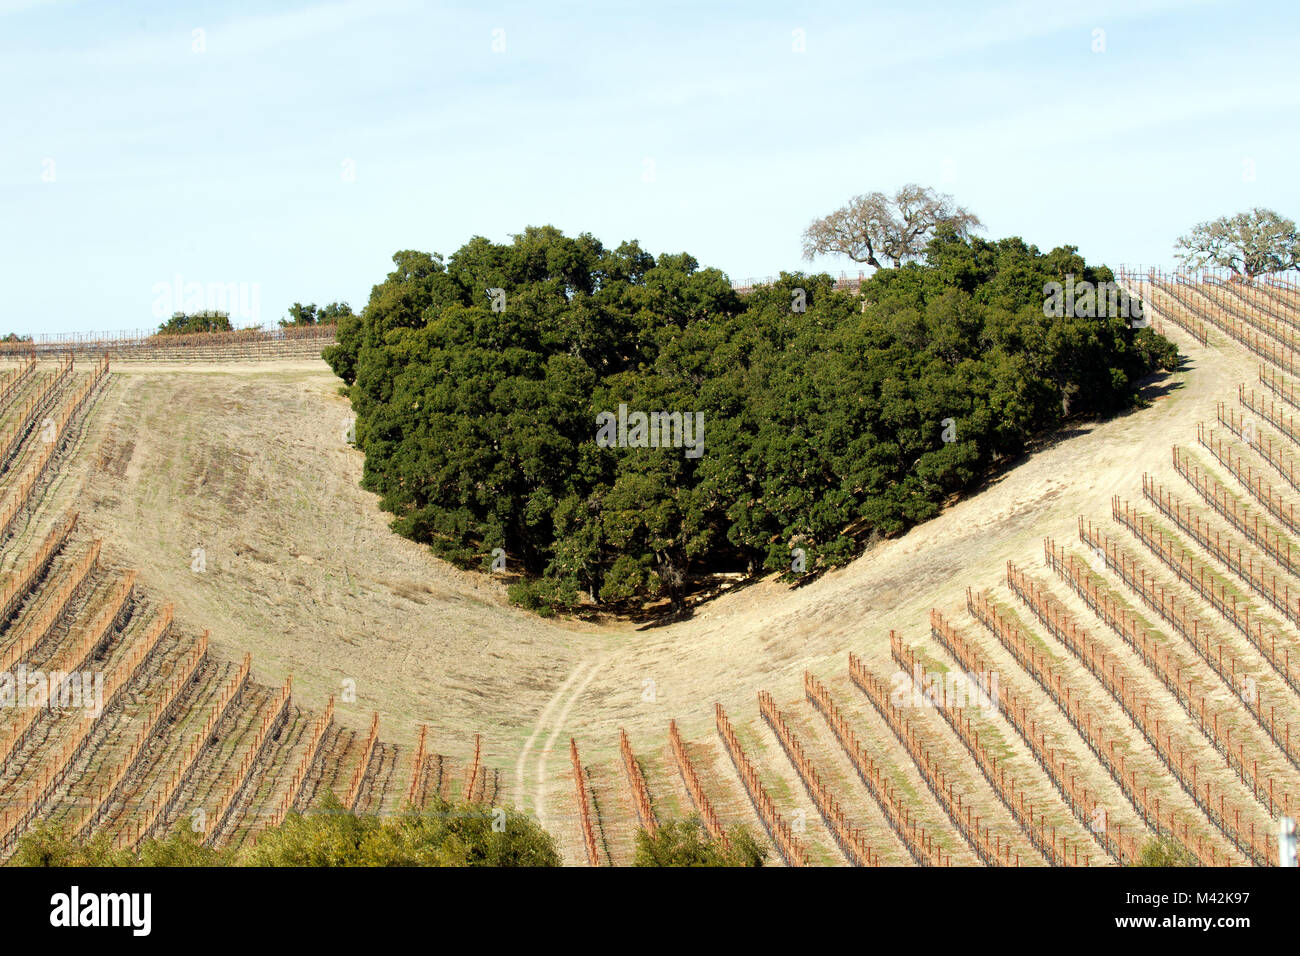 Heart Shaped Grove of Trees on Hillside Vineyard Stock Photo